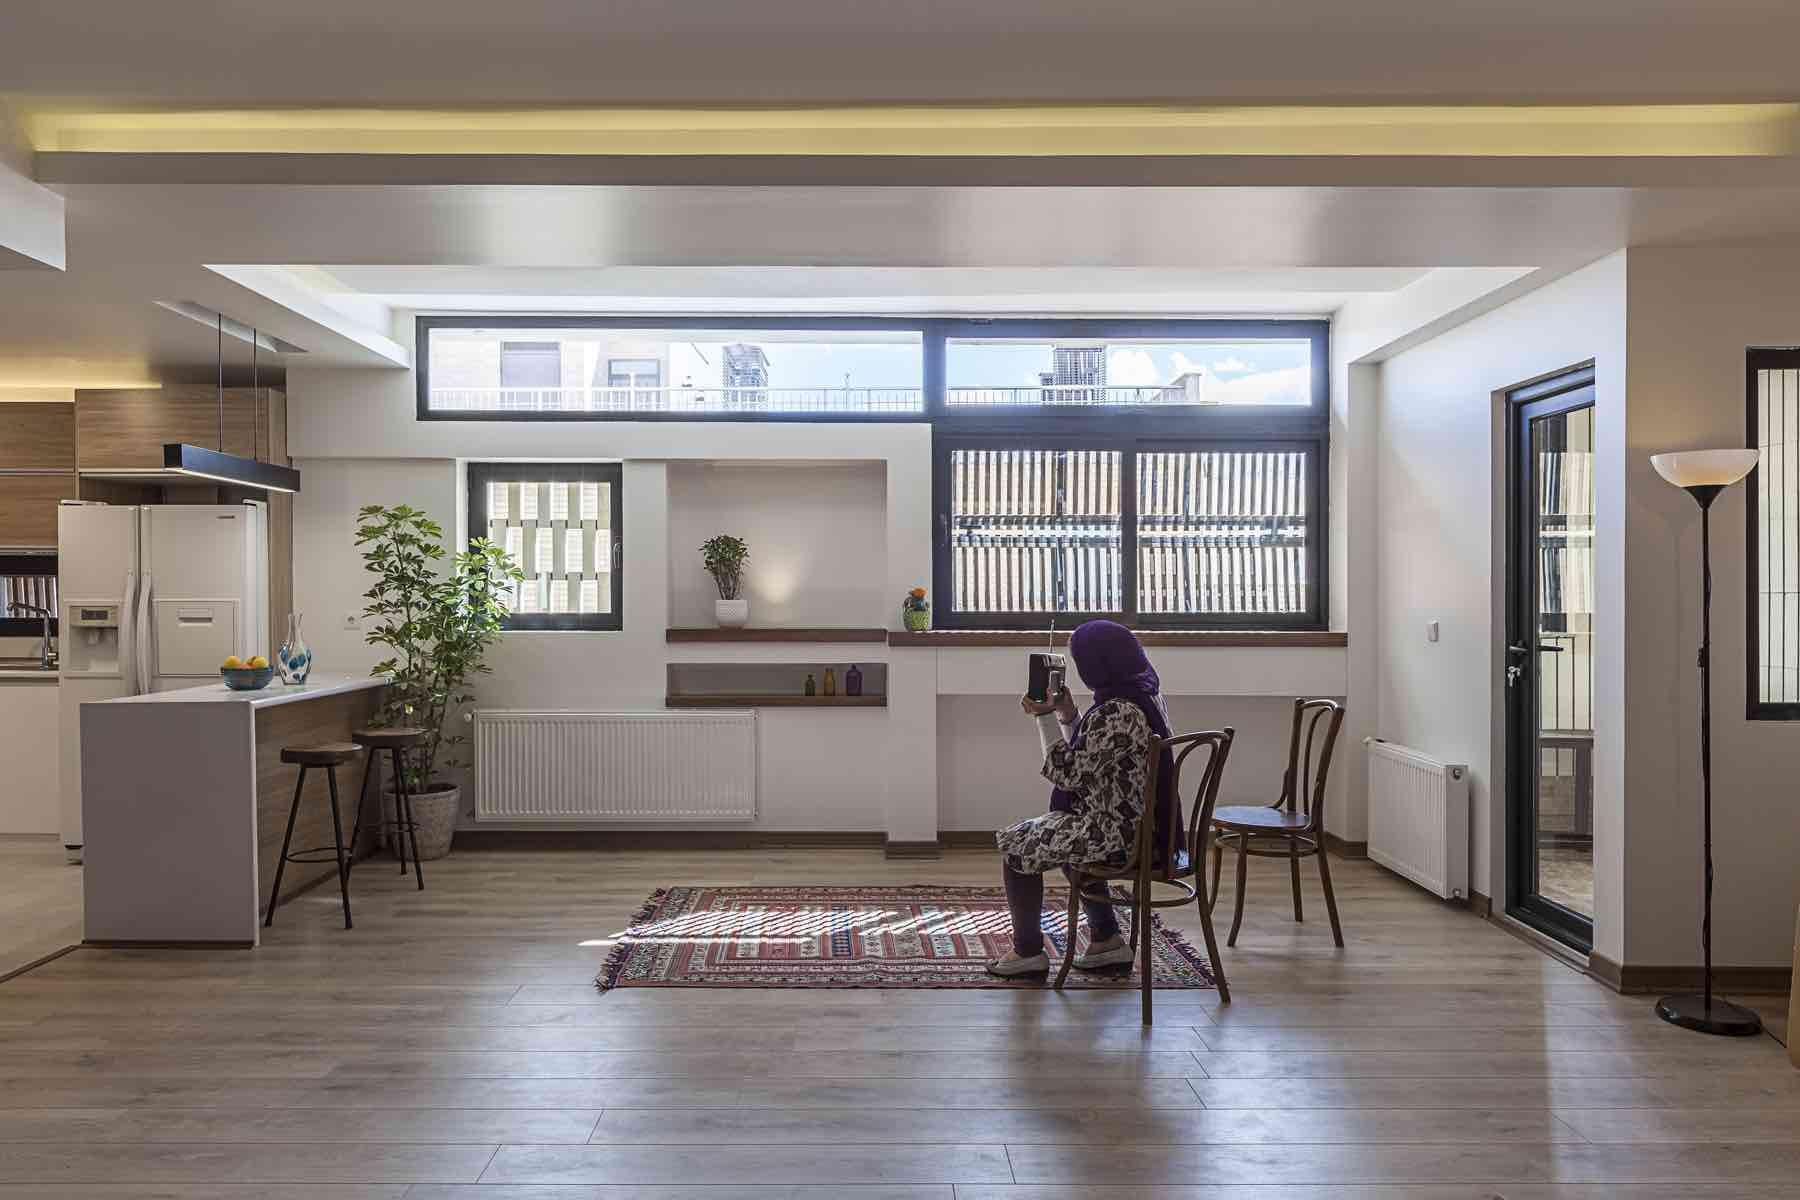 Rouzan_Residential_Building_Sayed_hamed_jafari_Charchoob_Architecture_Office_008.jpg